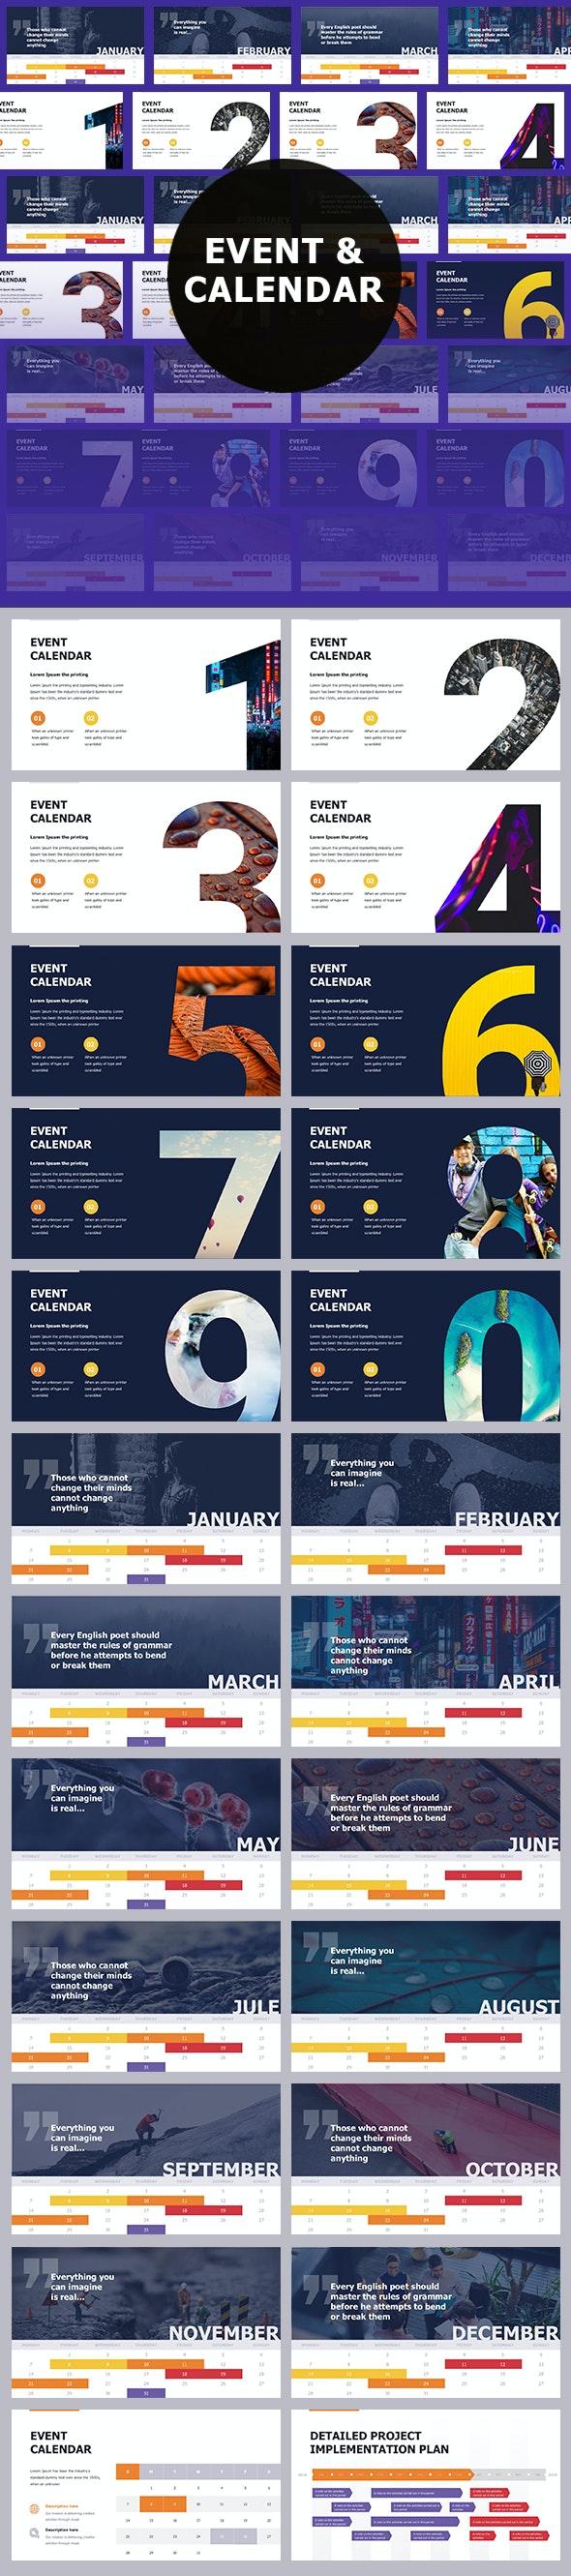 Event & Calendar Keynote Themes - Creative Keynote Templates